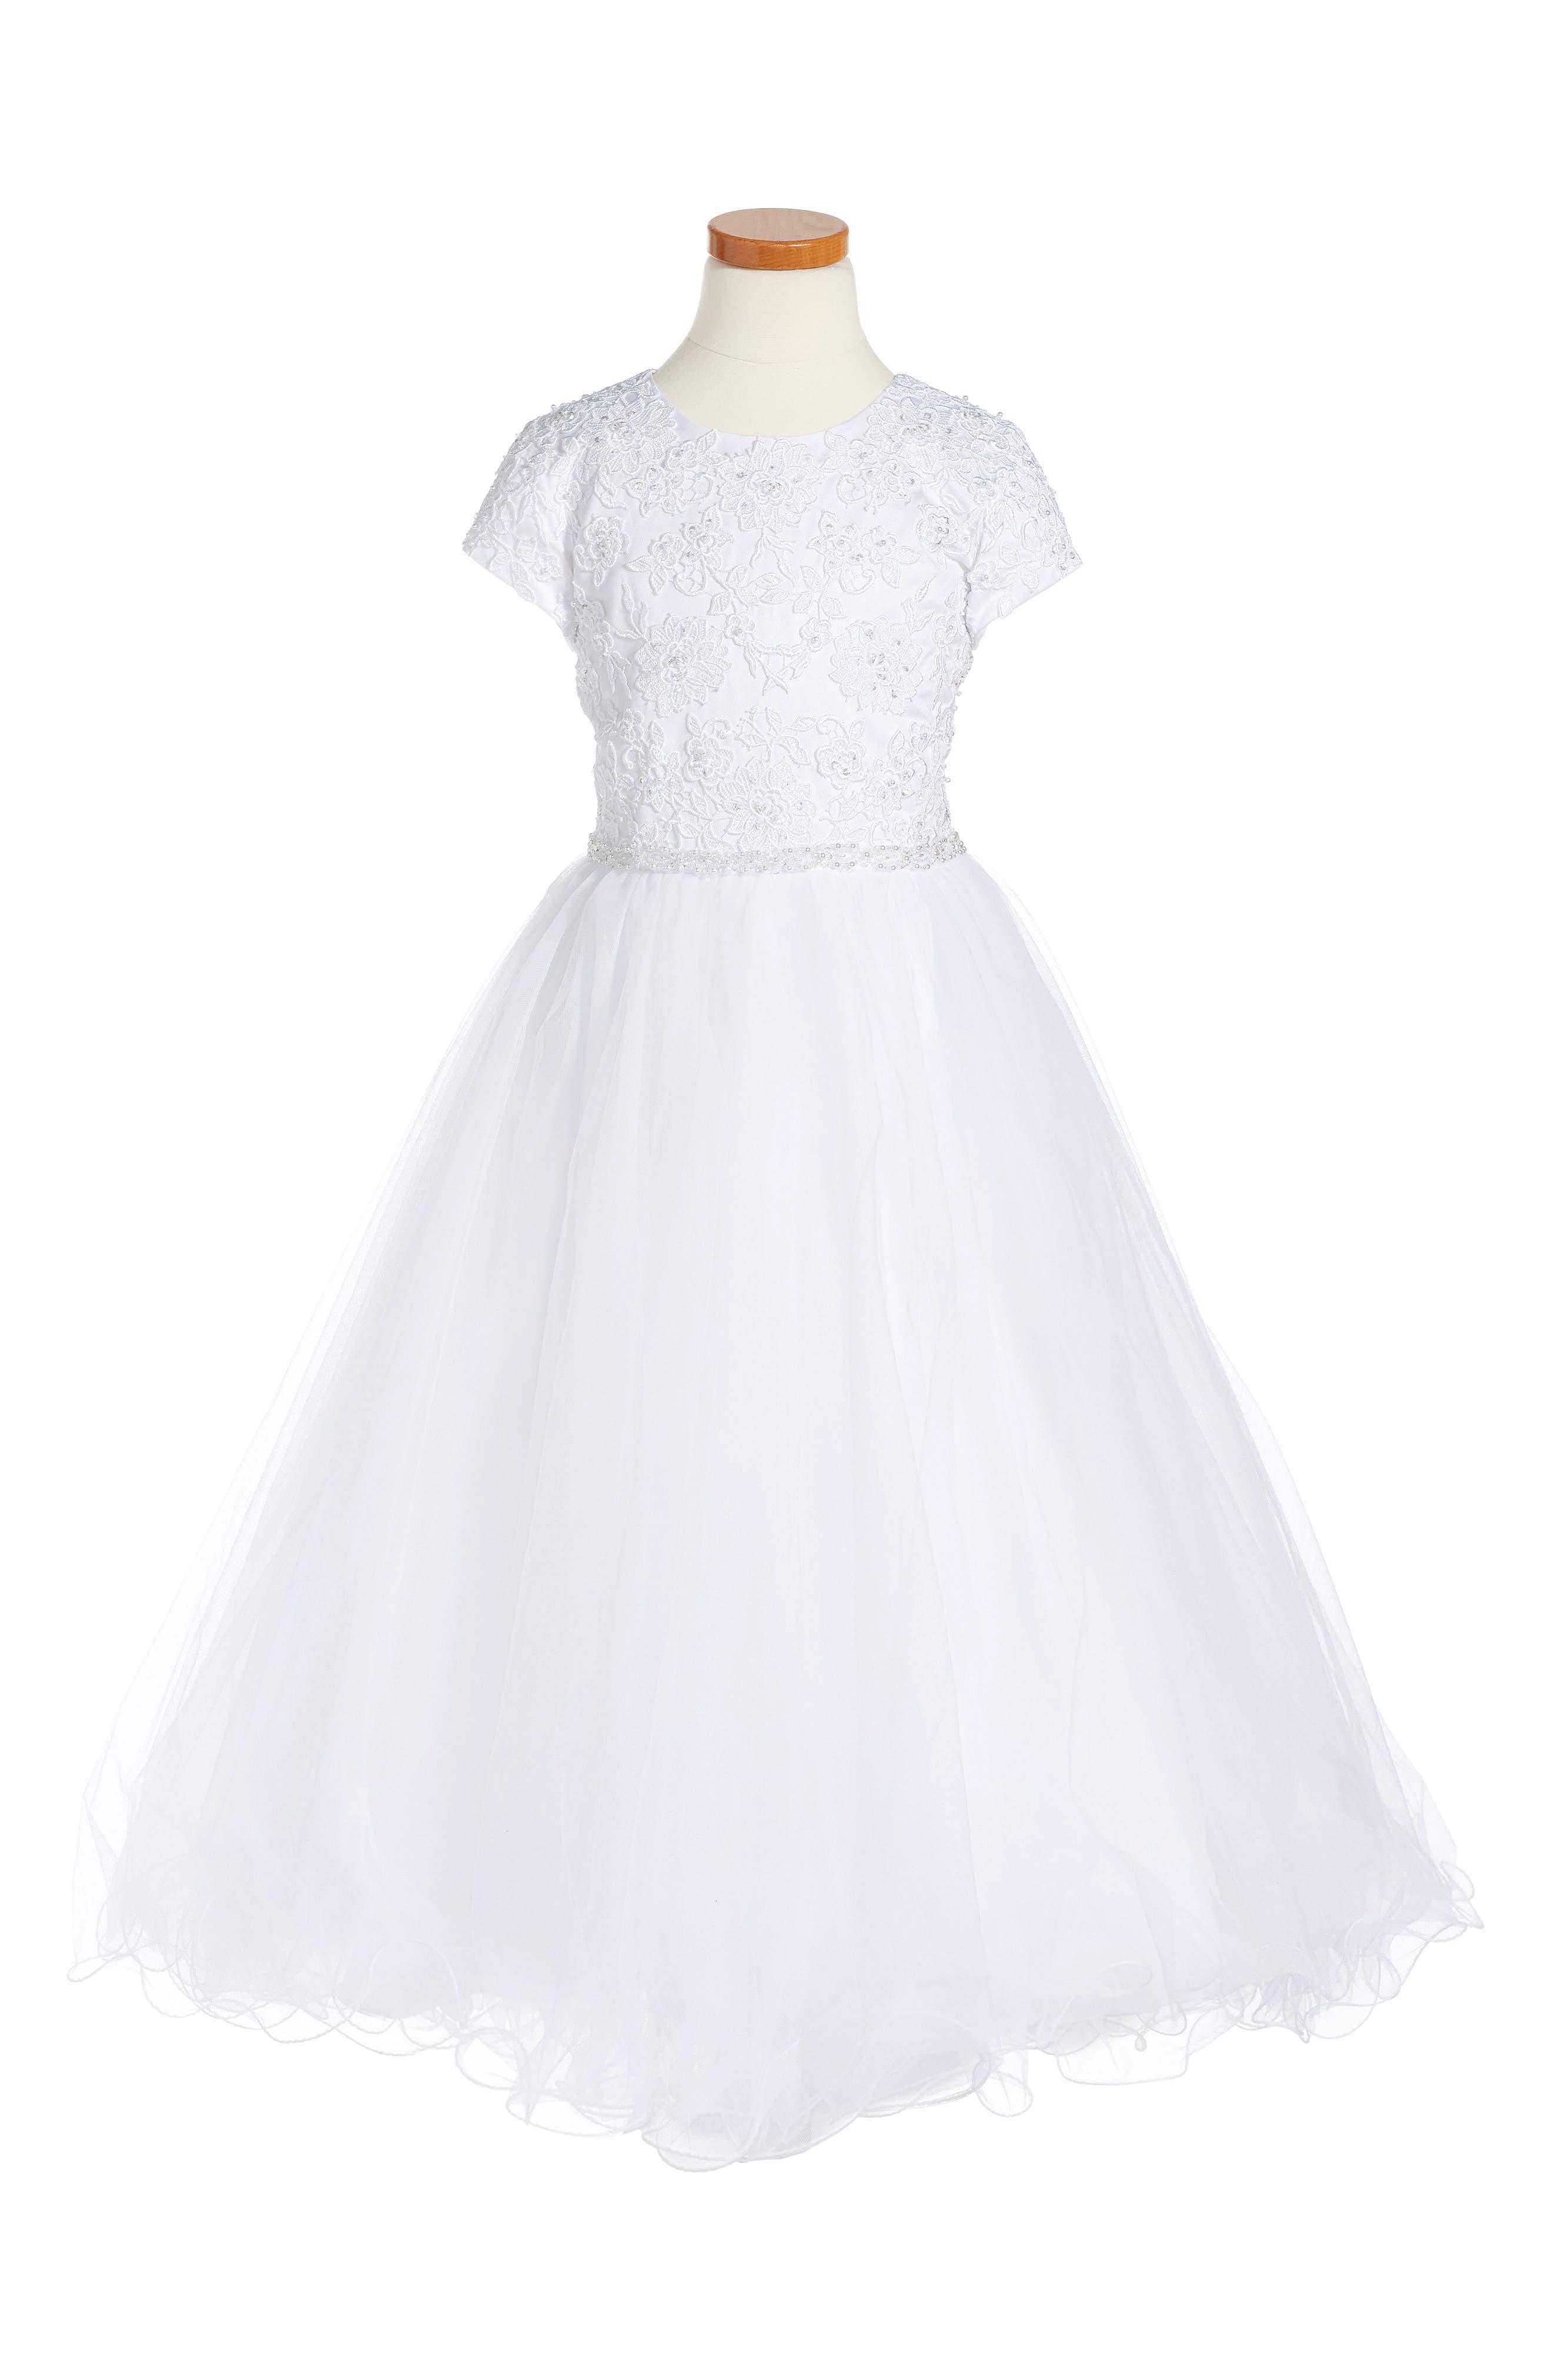 Joan Calabrese for Mon Cheri Floral Appliqué First Communion Dress (Little Girls & Big Girls)